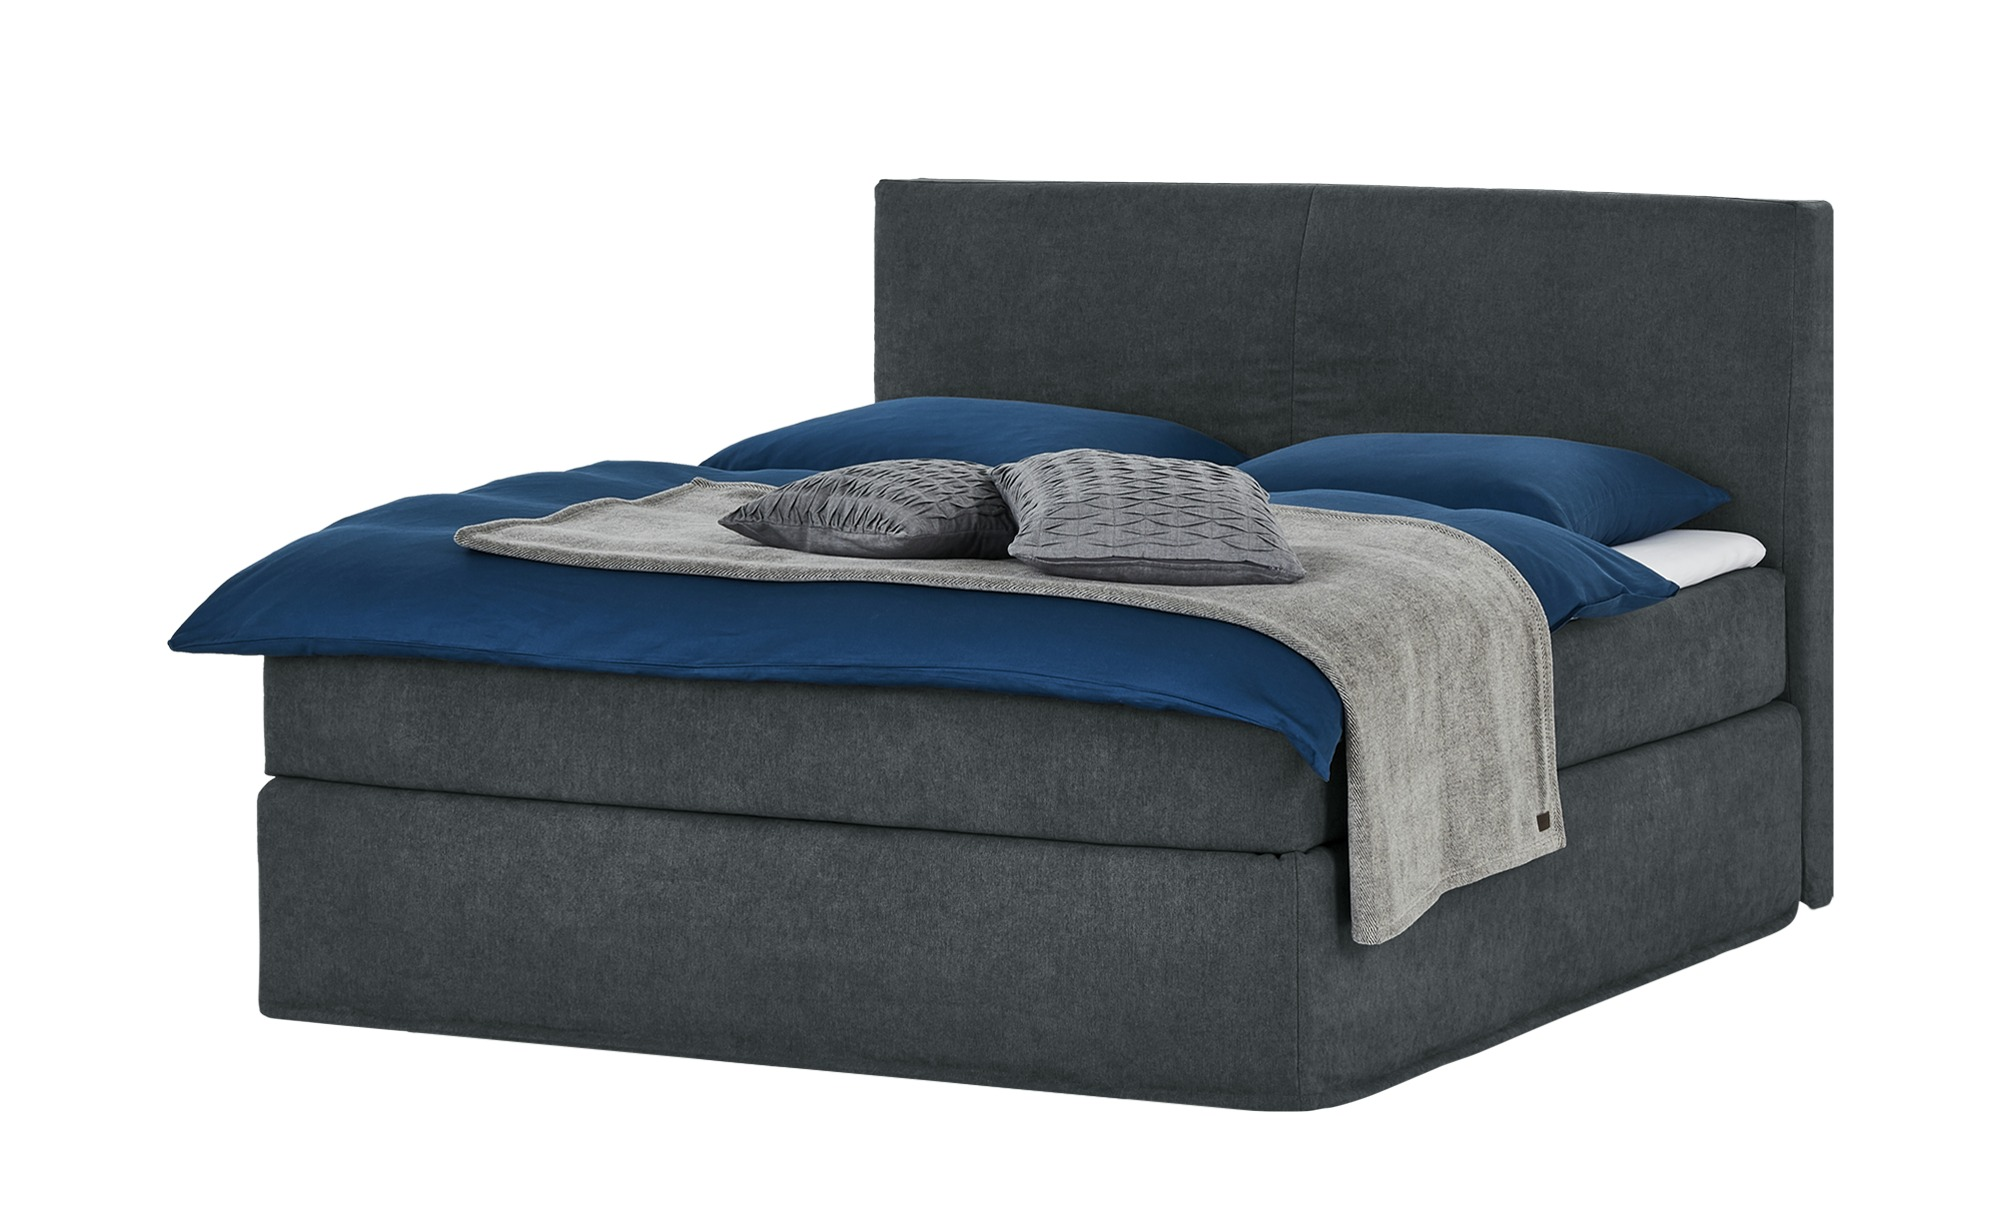 Boxspringbett 180 x 200 cm - grau - Betten > Boxspringbetten > Boxspringbet günstig online kaufen